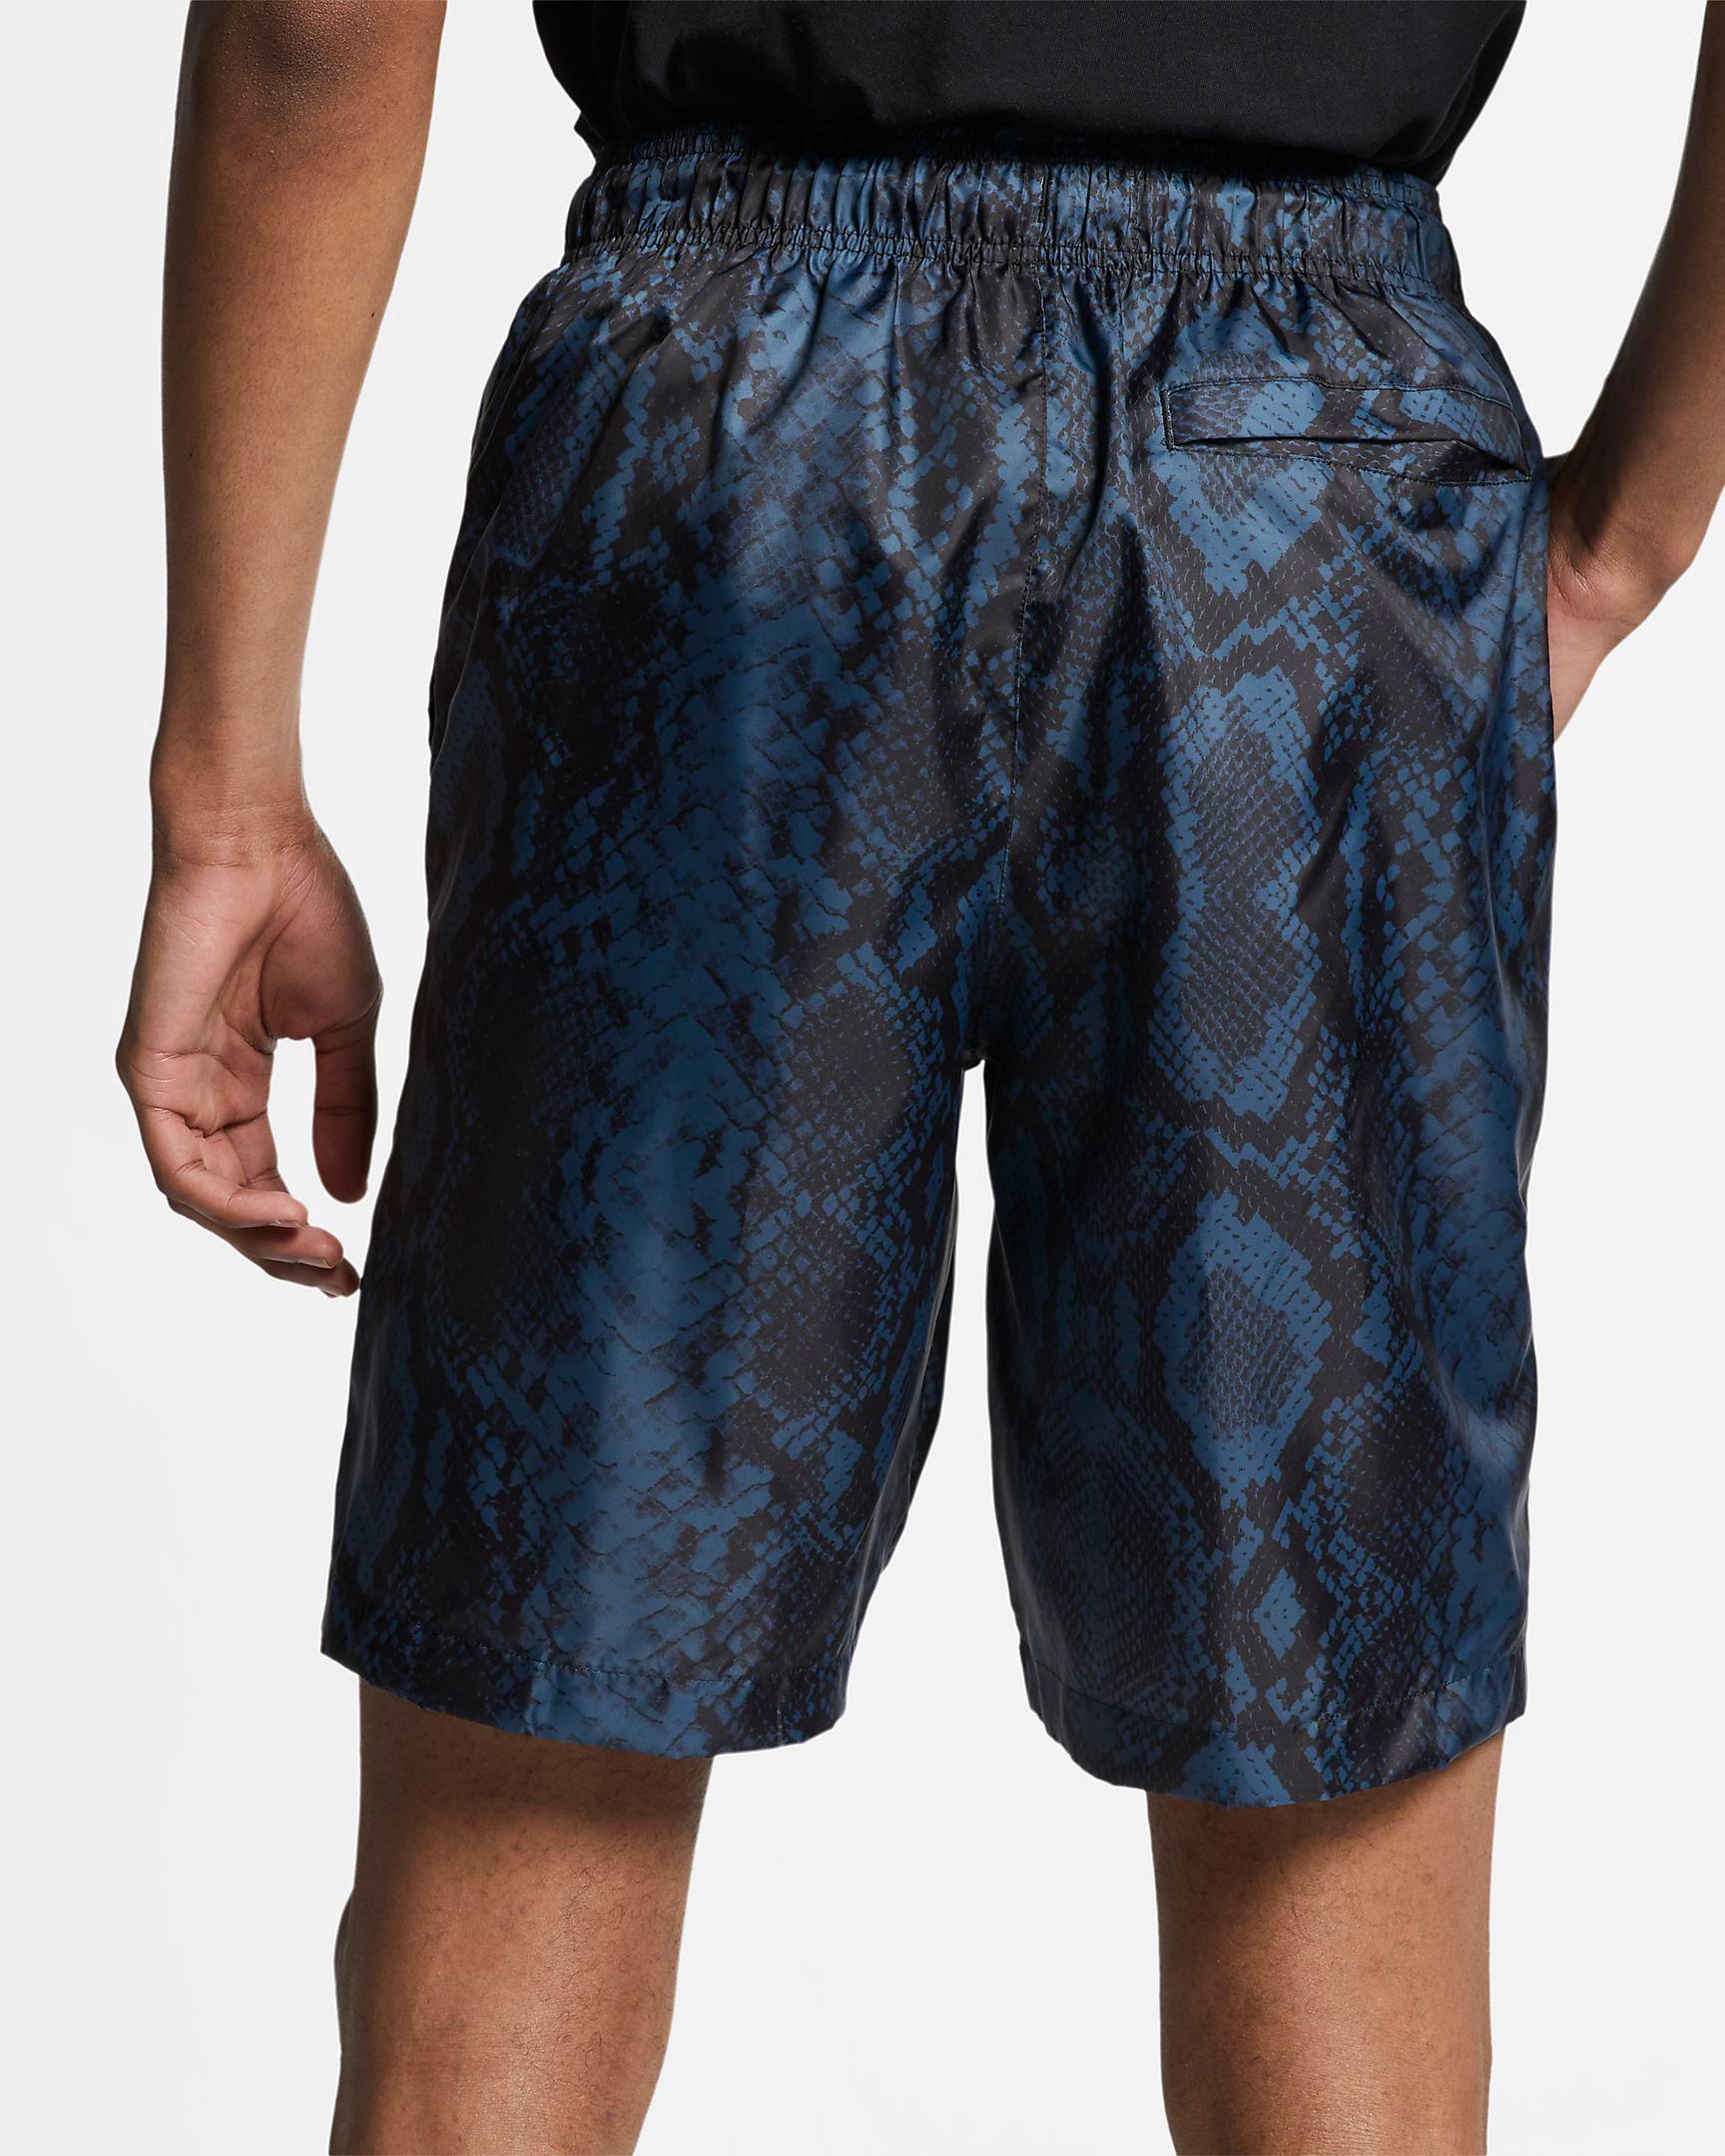 air-jordan-11-low-snakeskin-navy-blue-shorts-2